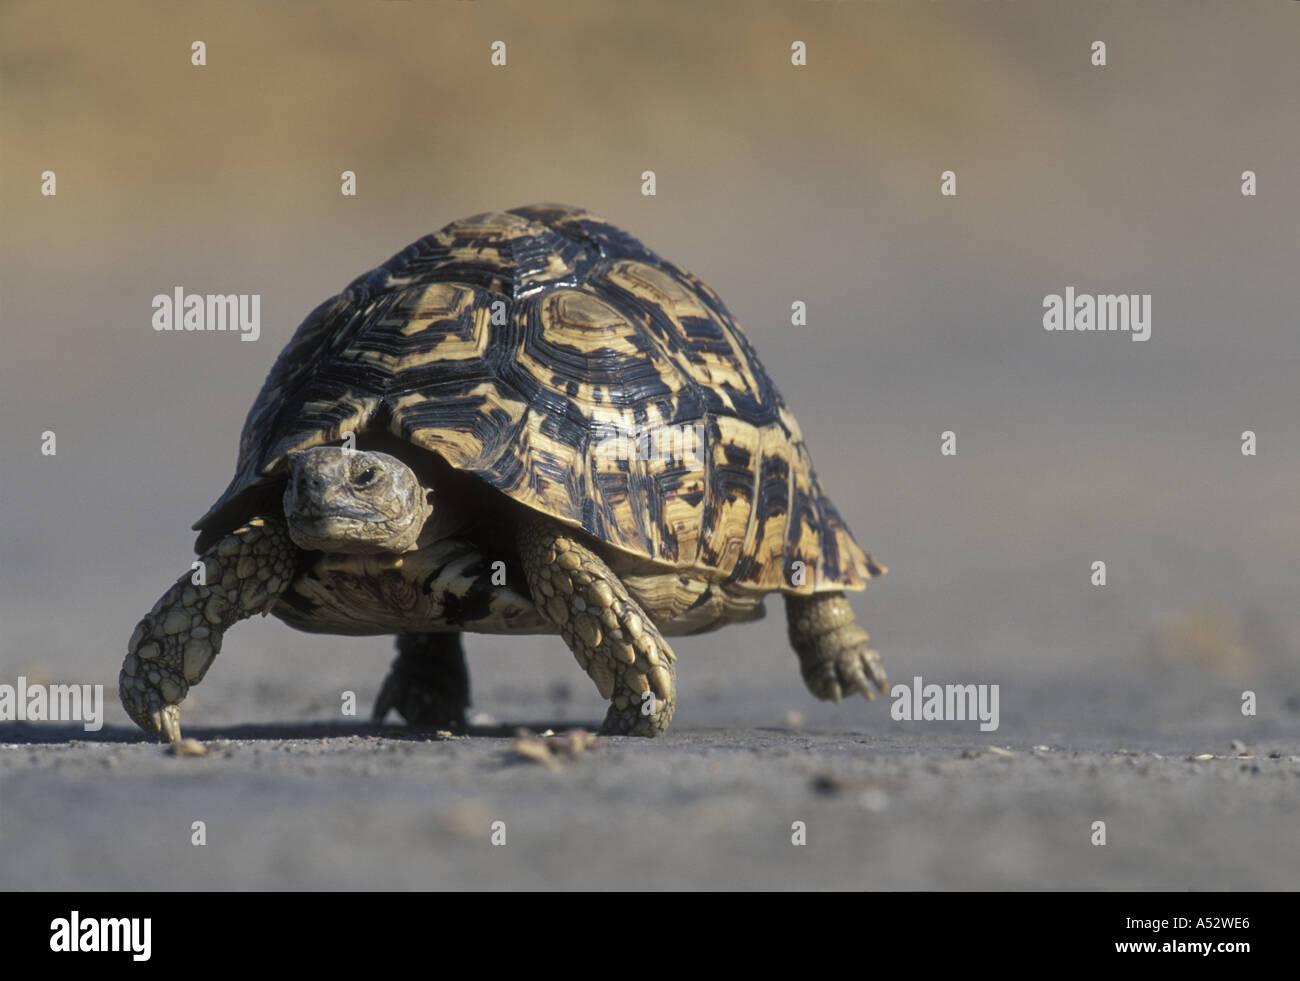 Botswana Chobe National Park Leopard Tortoise Geochelone pardalis slowly walks through dry sand in Savuti Marsh - Stock Image